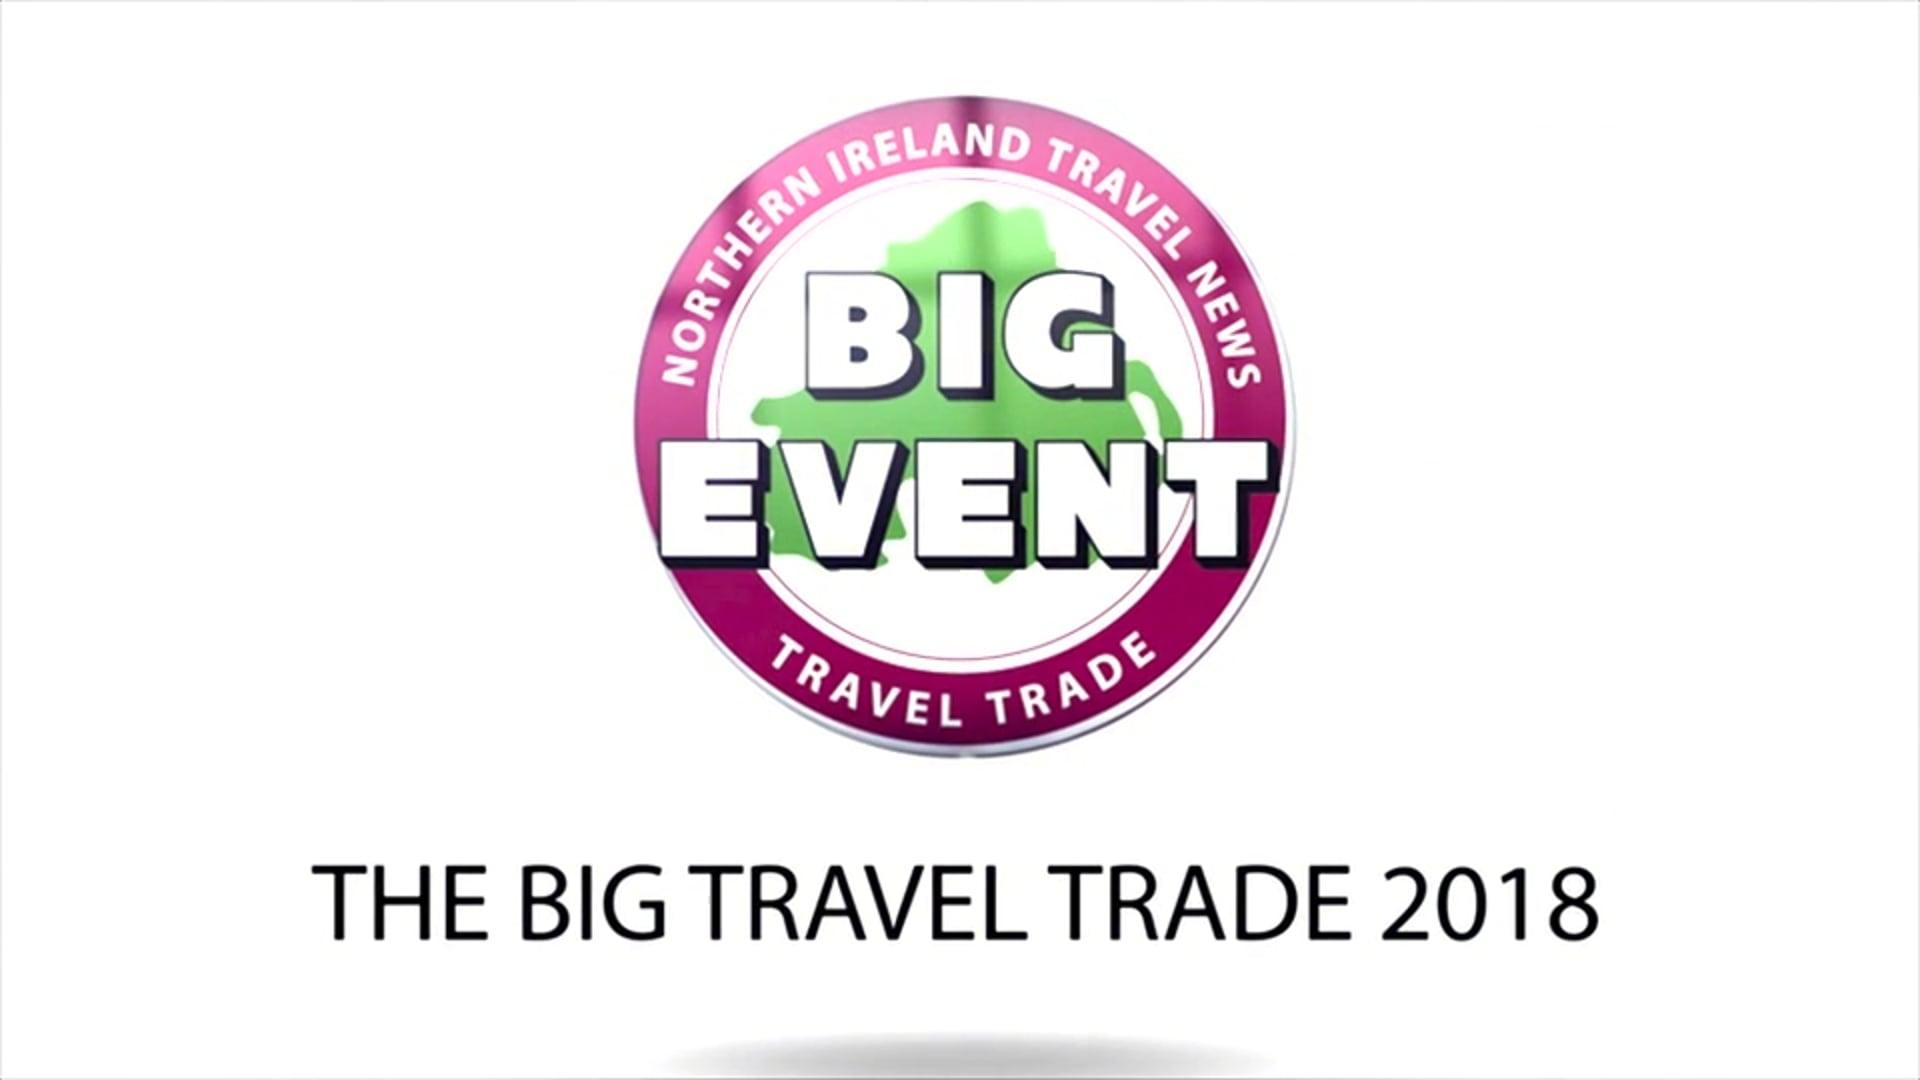 THE BIG TRAVEL TRADE 2018